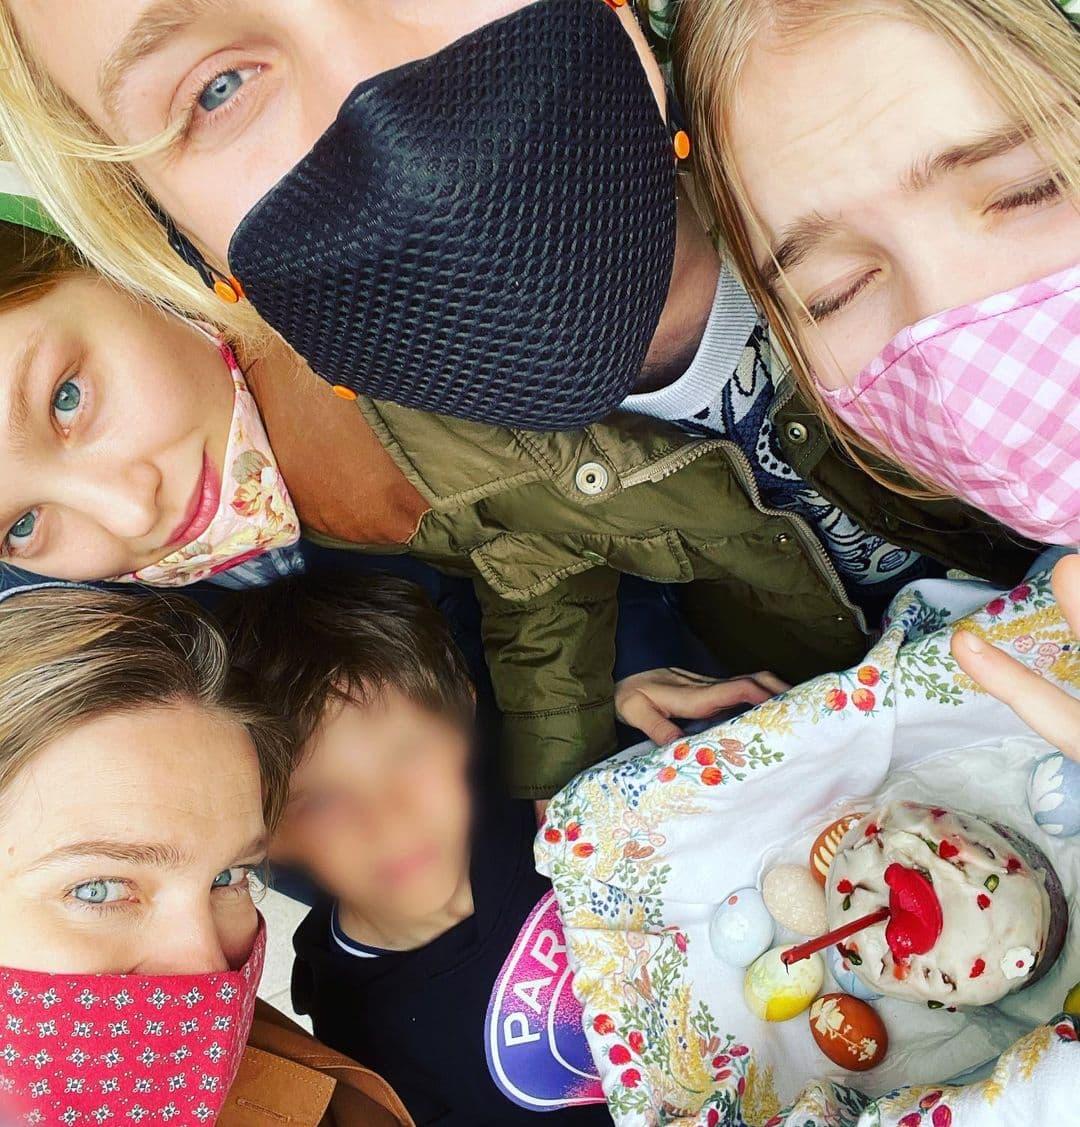 Наталья Водянова. (Фото: Instagram)